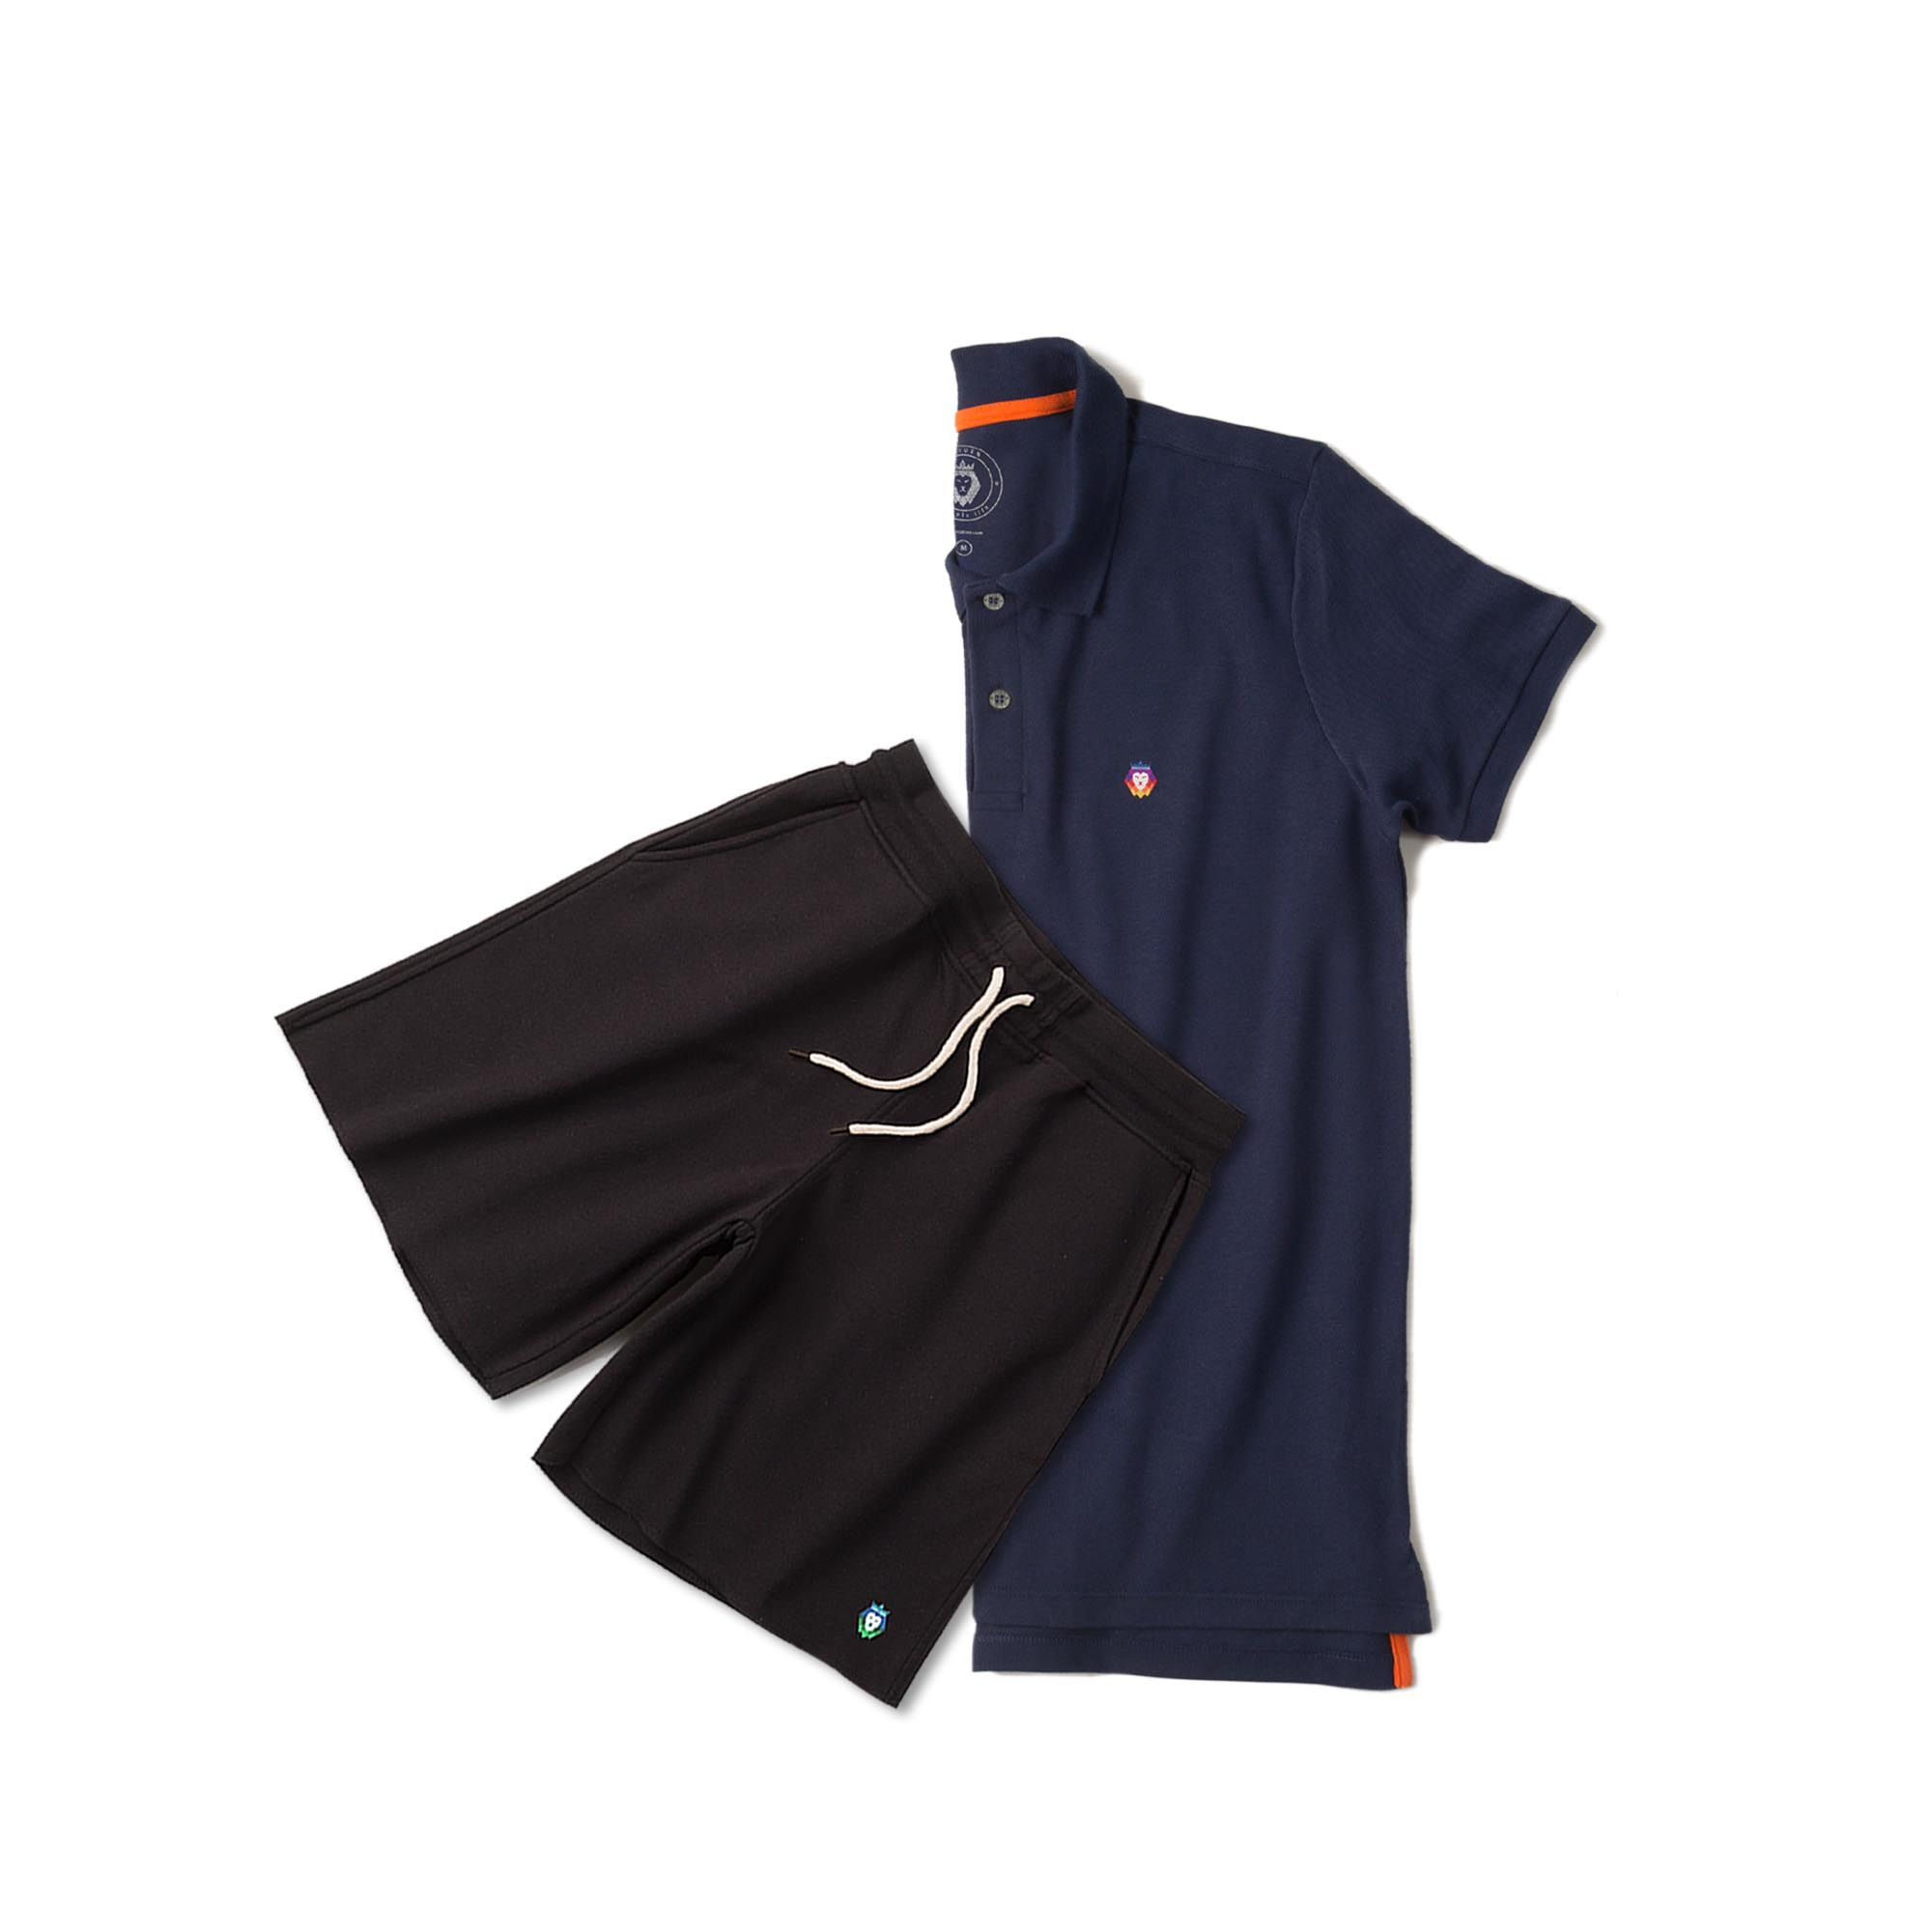 Kit 1 Bermuda Basic Preta + 1 Camisa Polo Style Azul Marinho Zaiden Masculina